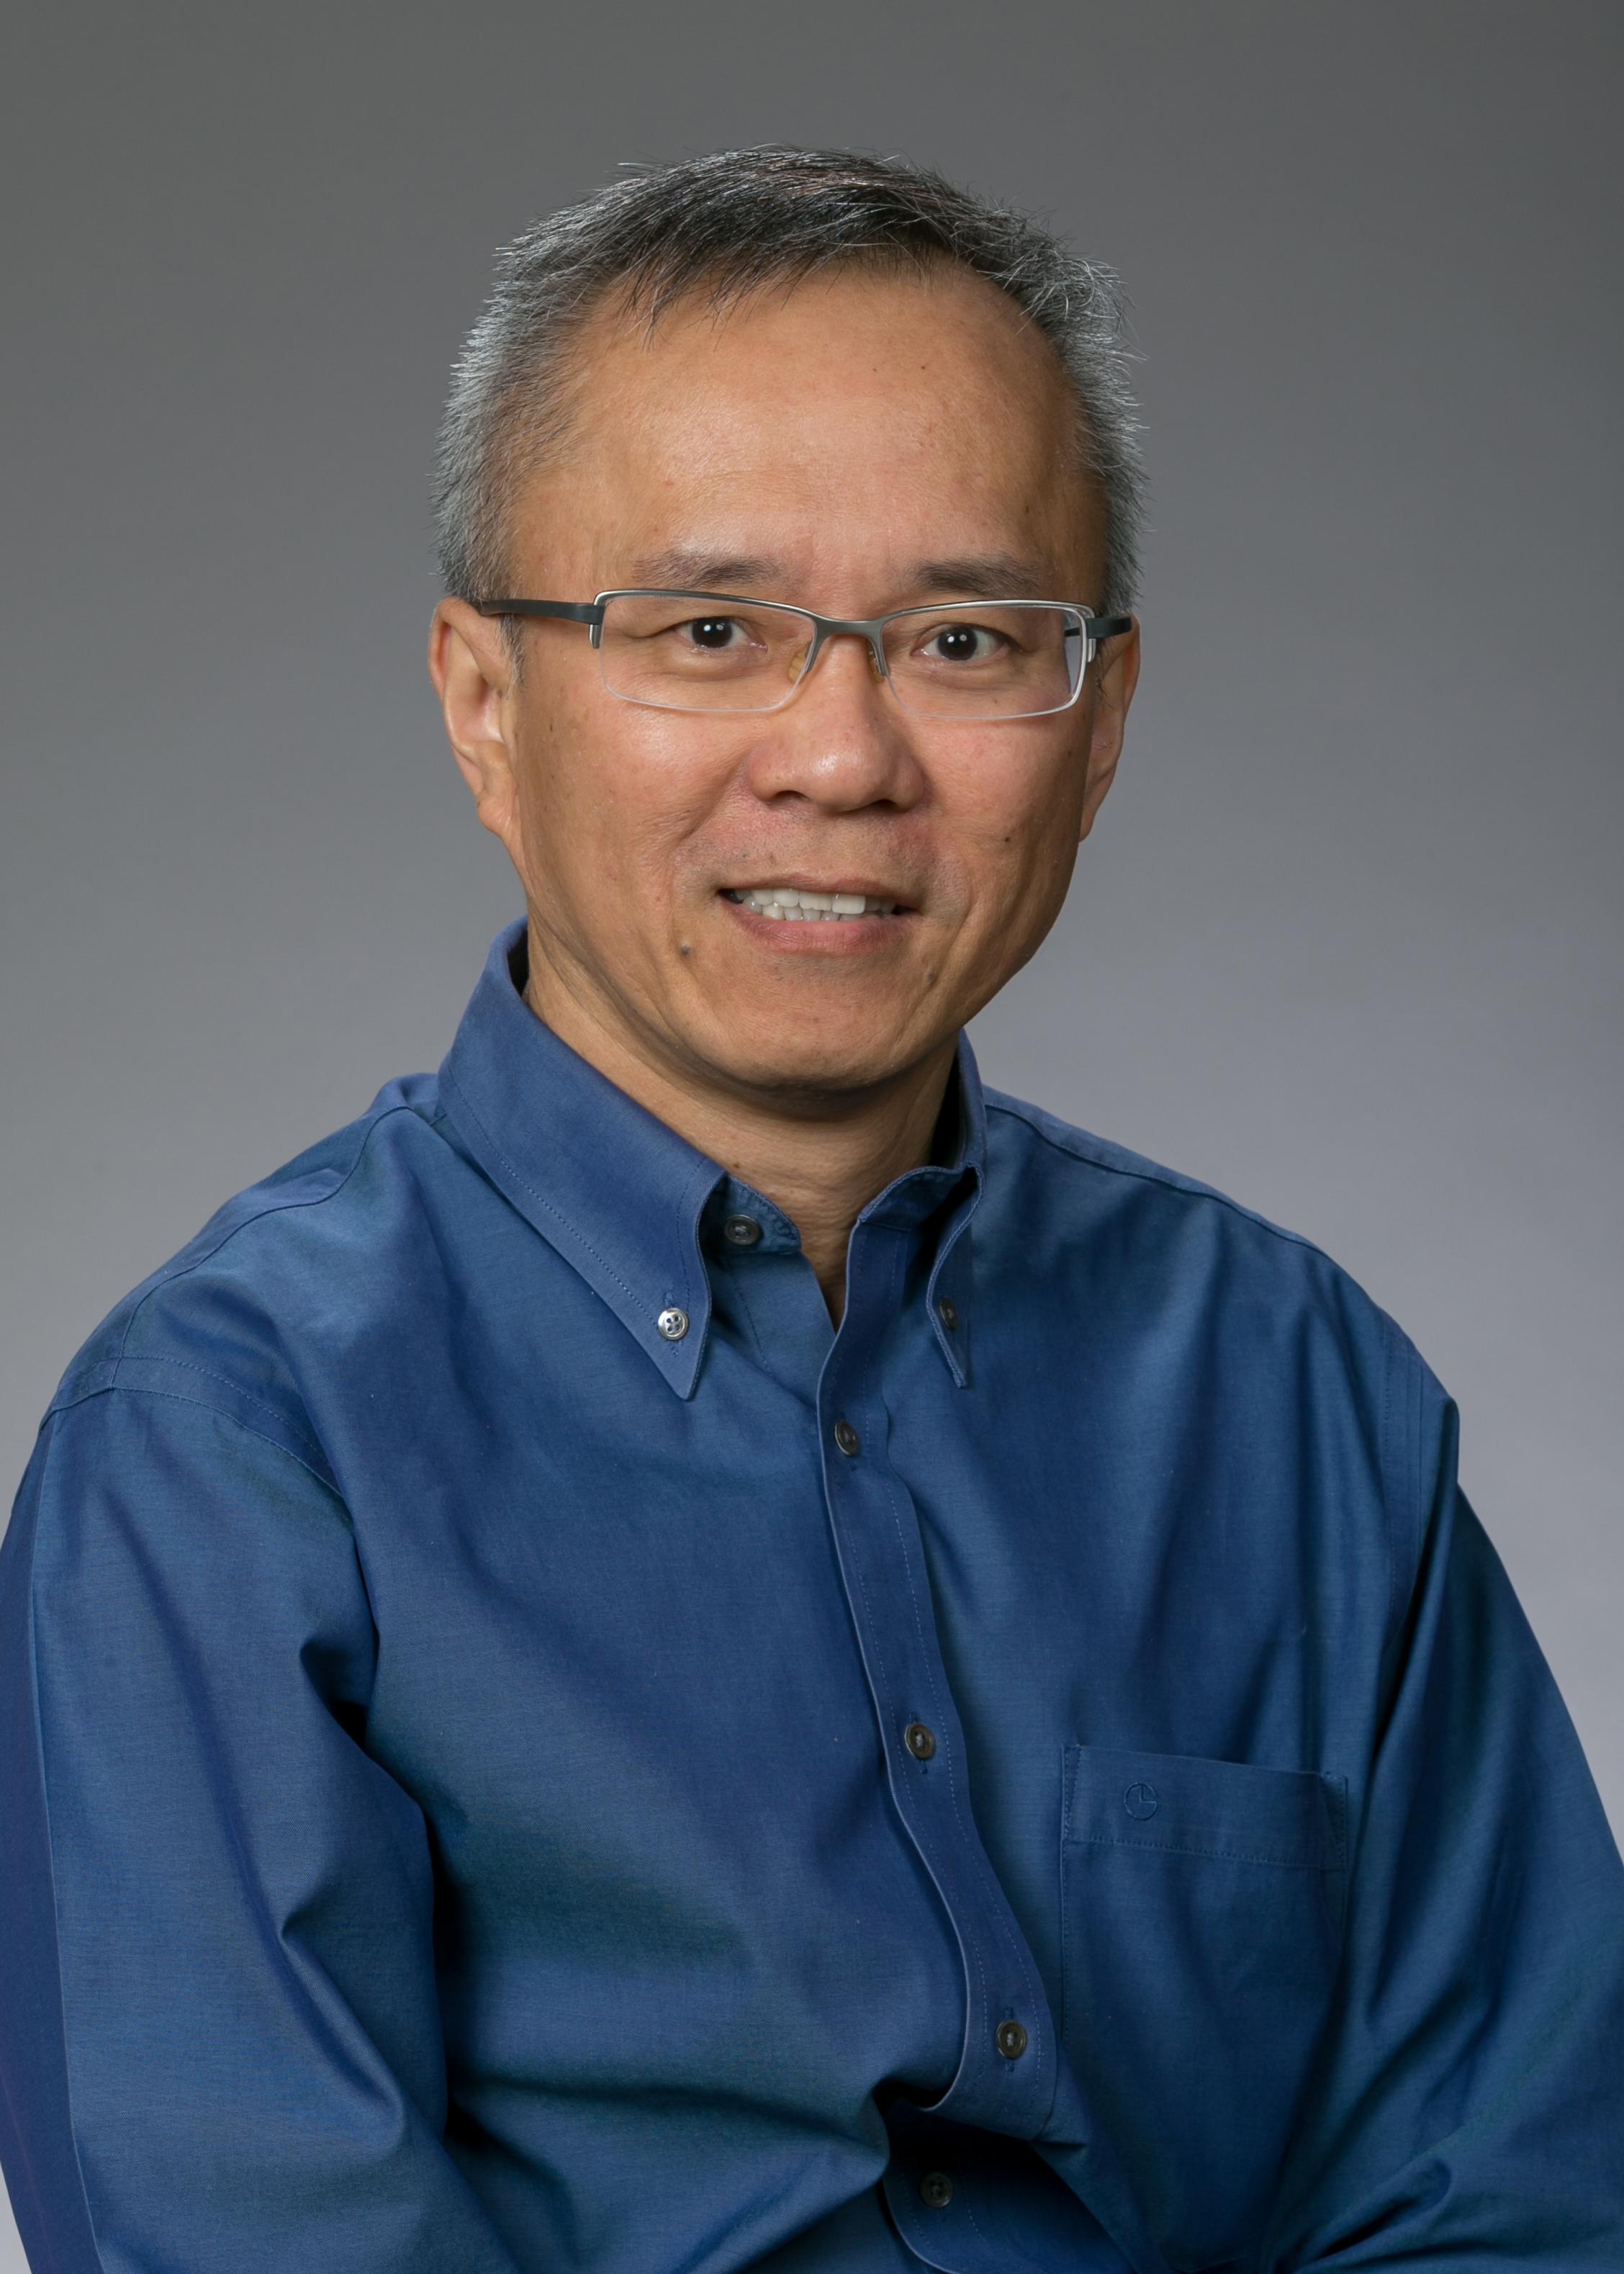 Charlie-Goh-General-Manager-Suzhou-China